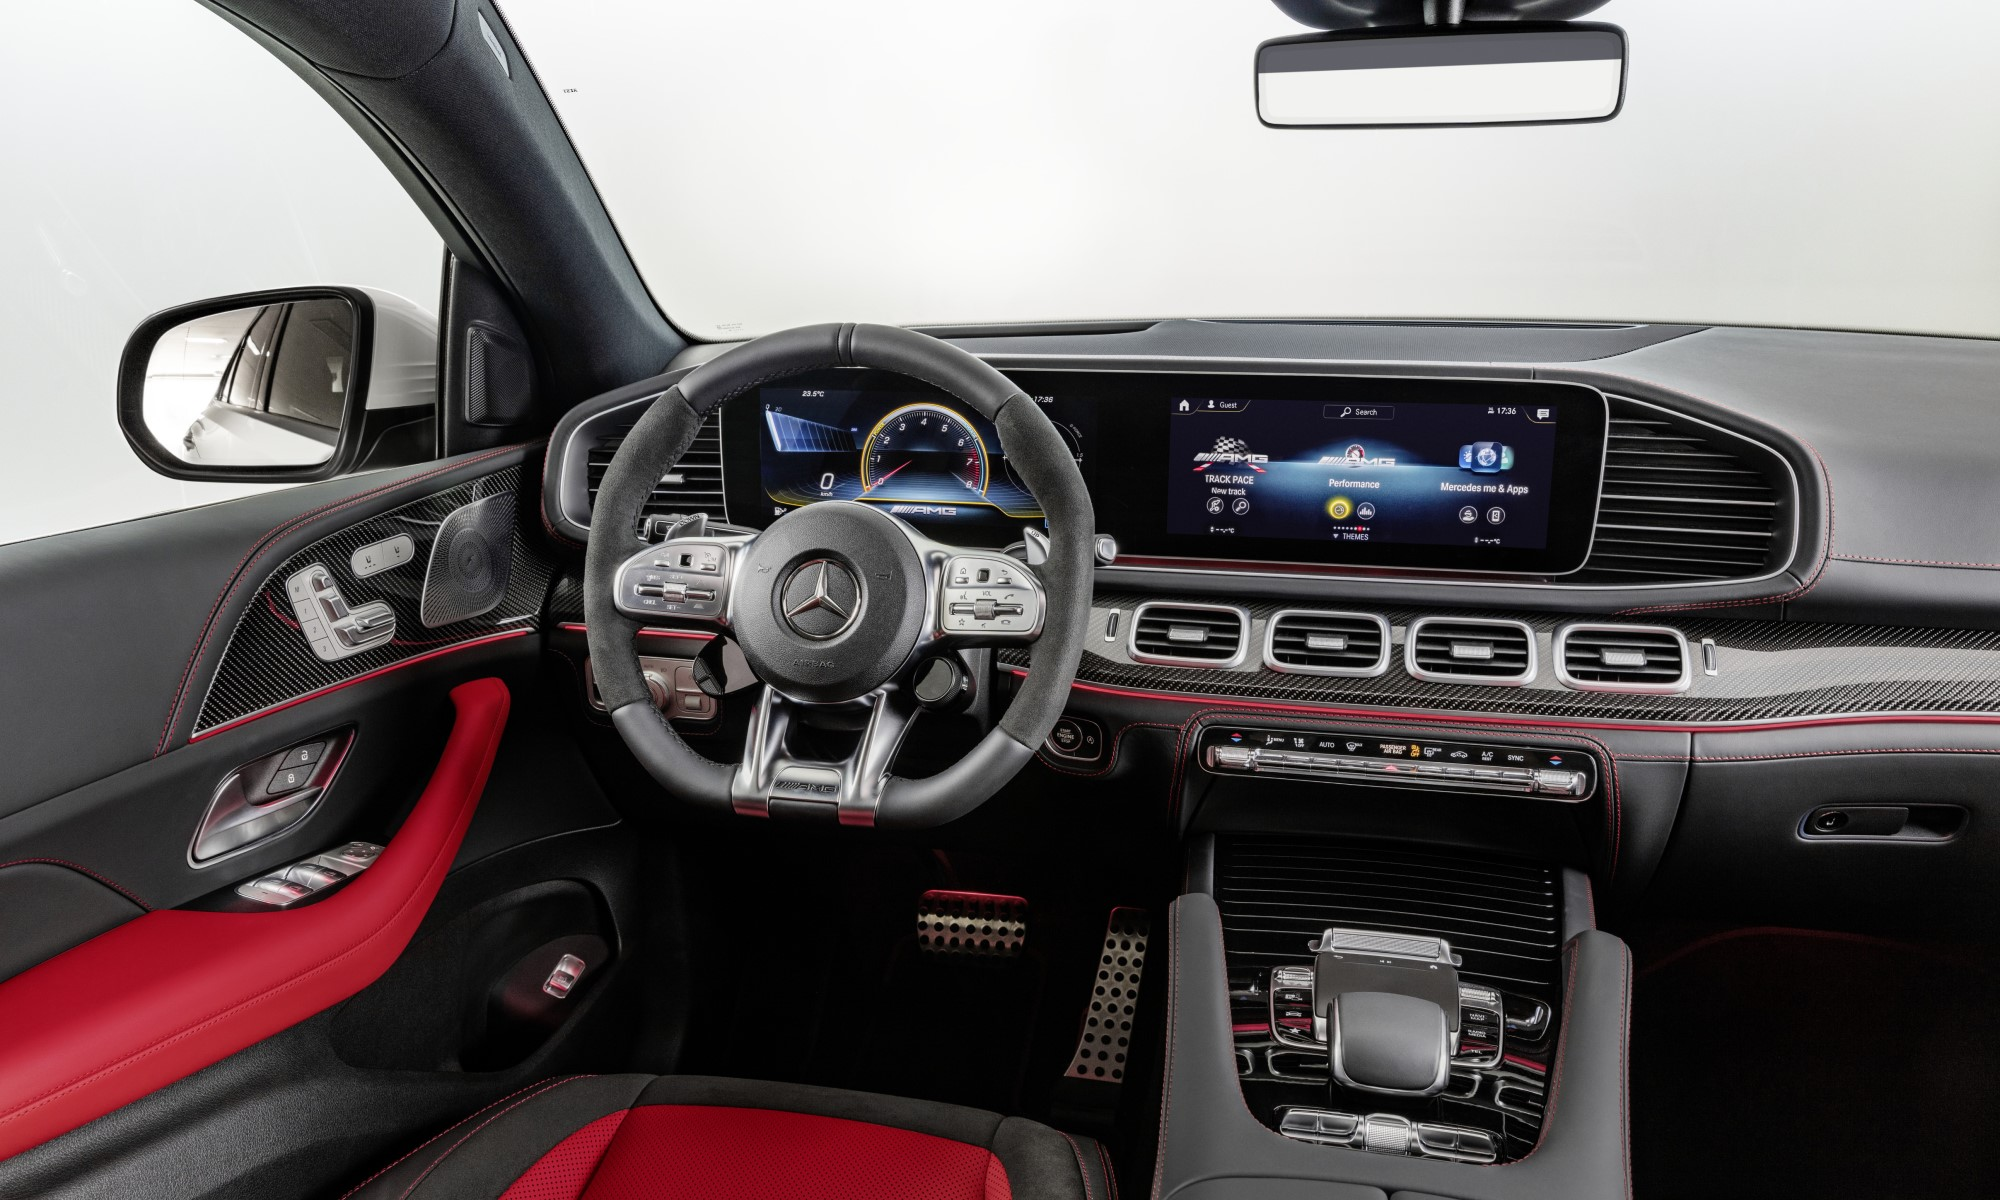 Mercedes-AMG GLE53 interior